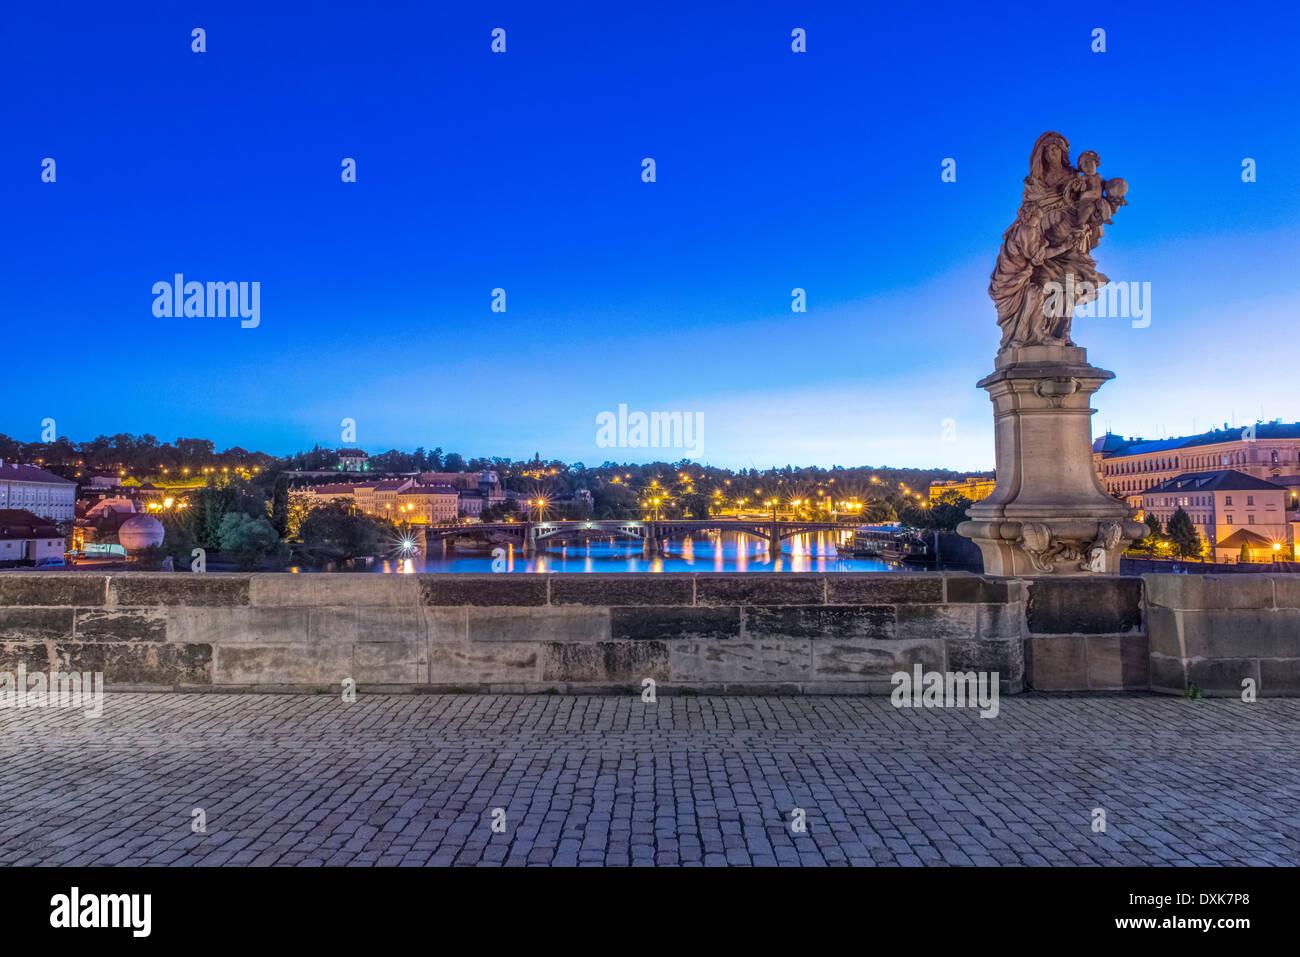 Statue and cobblestones on Charles Bridge at dawn, Prague, Czech Republic - Stock Image